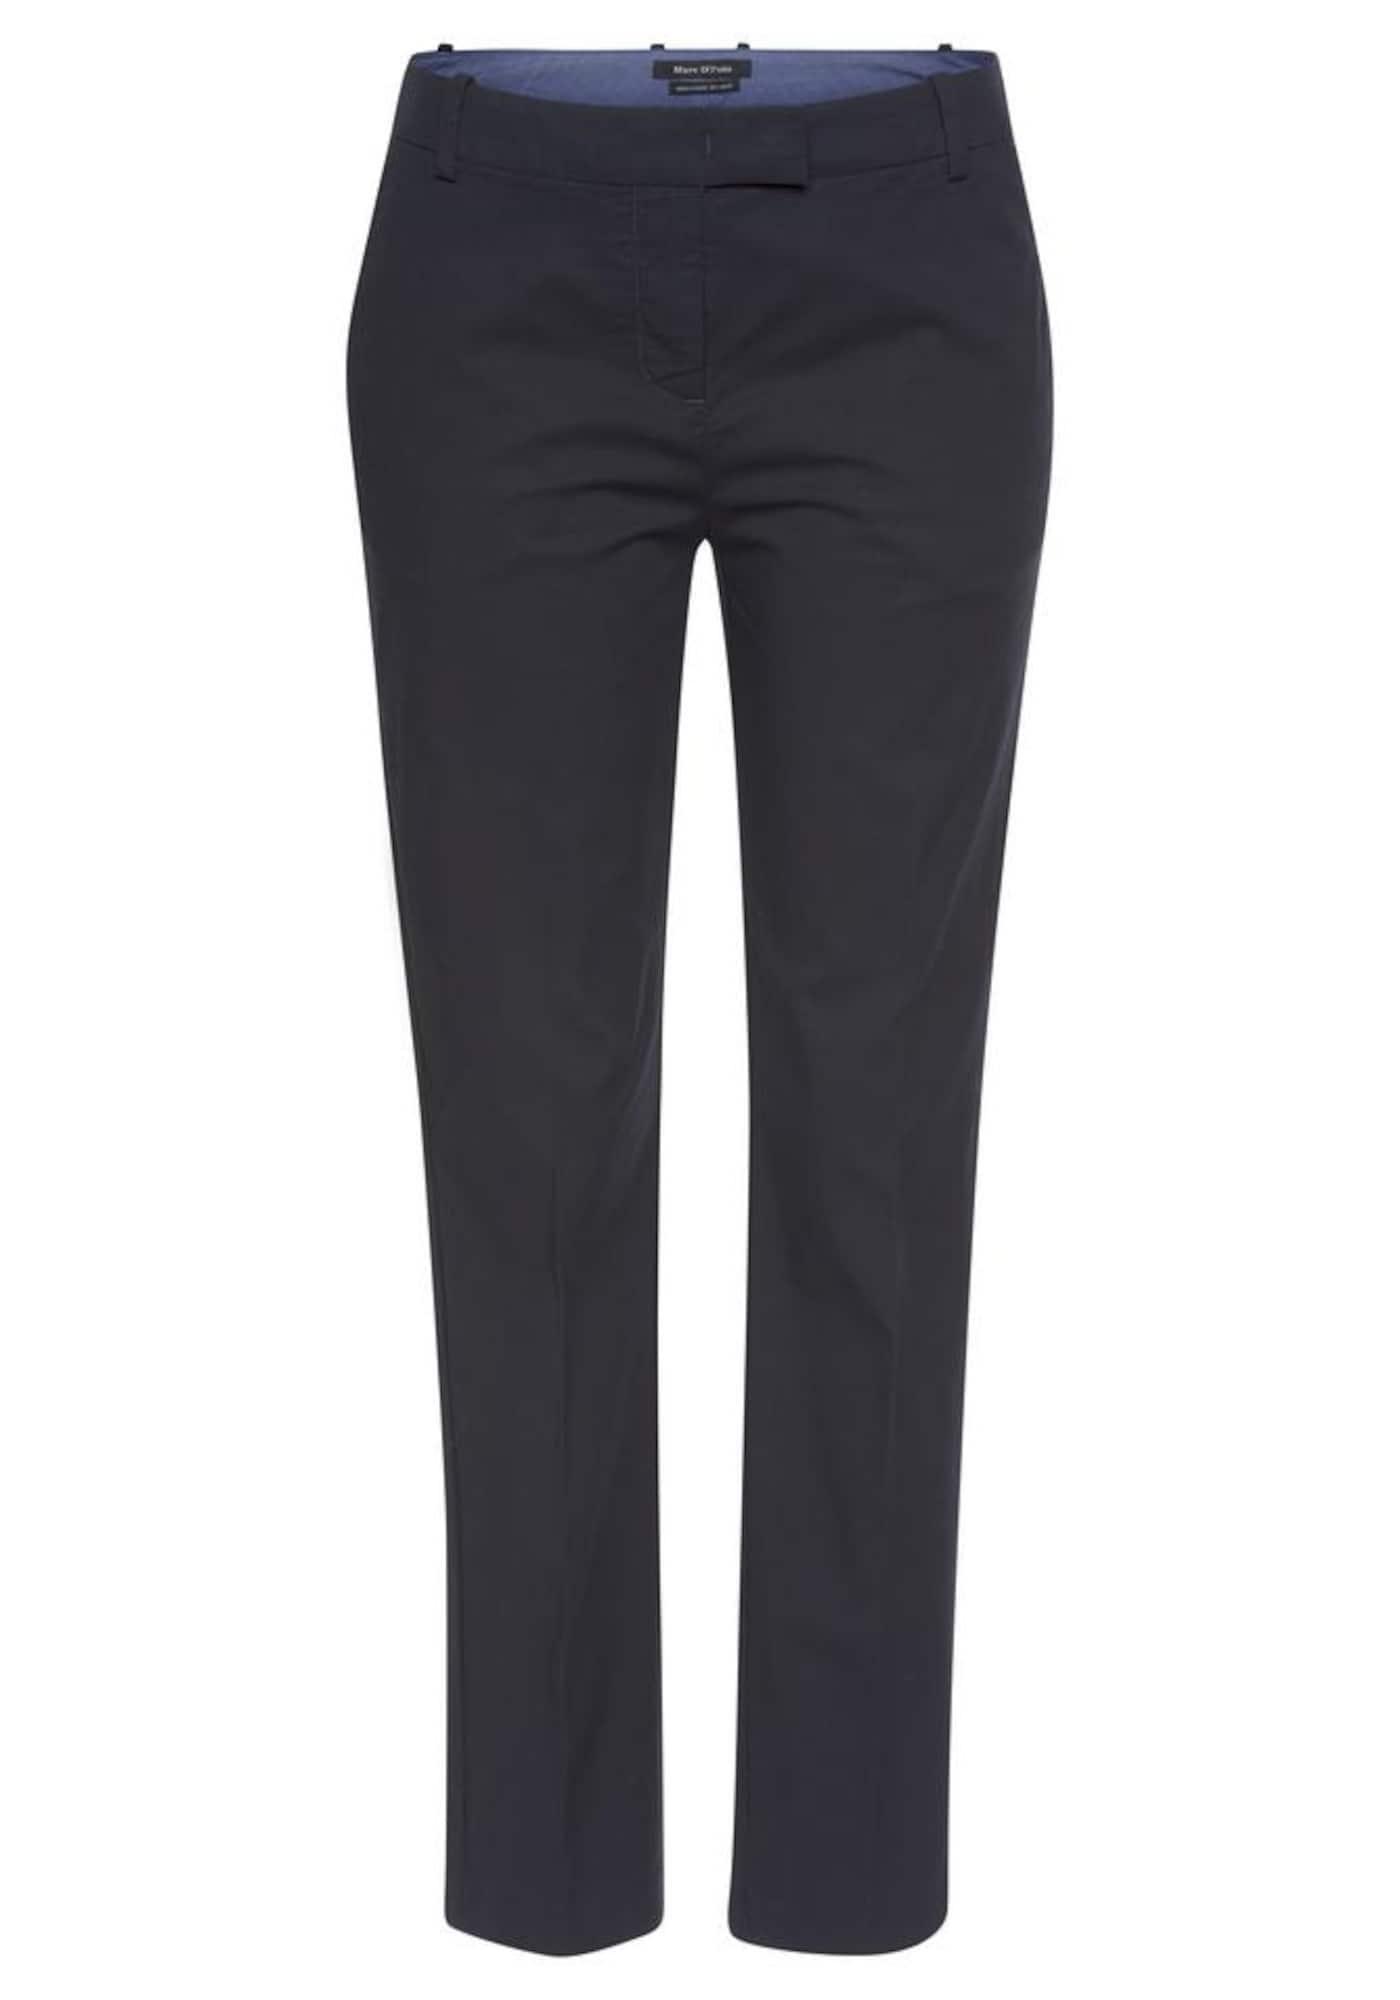 Marc O'Polo Chino kalhoty 'Torne'  kobaltová modř